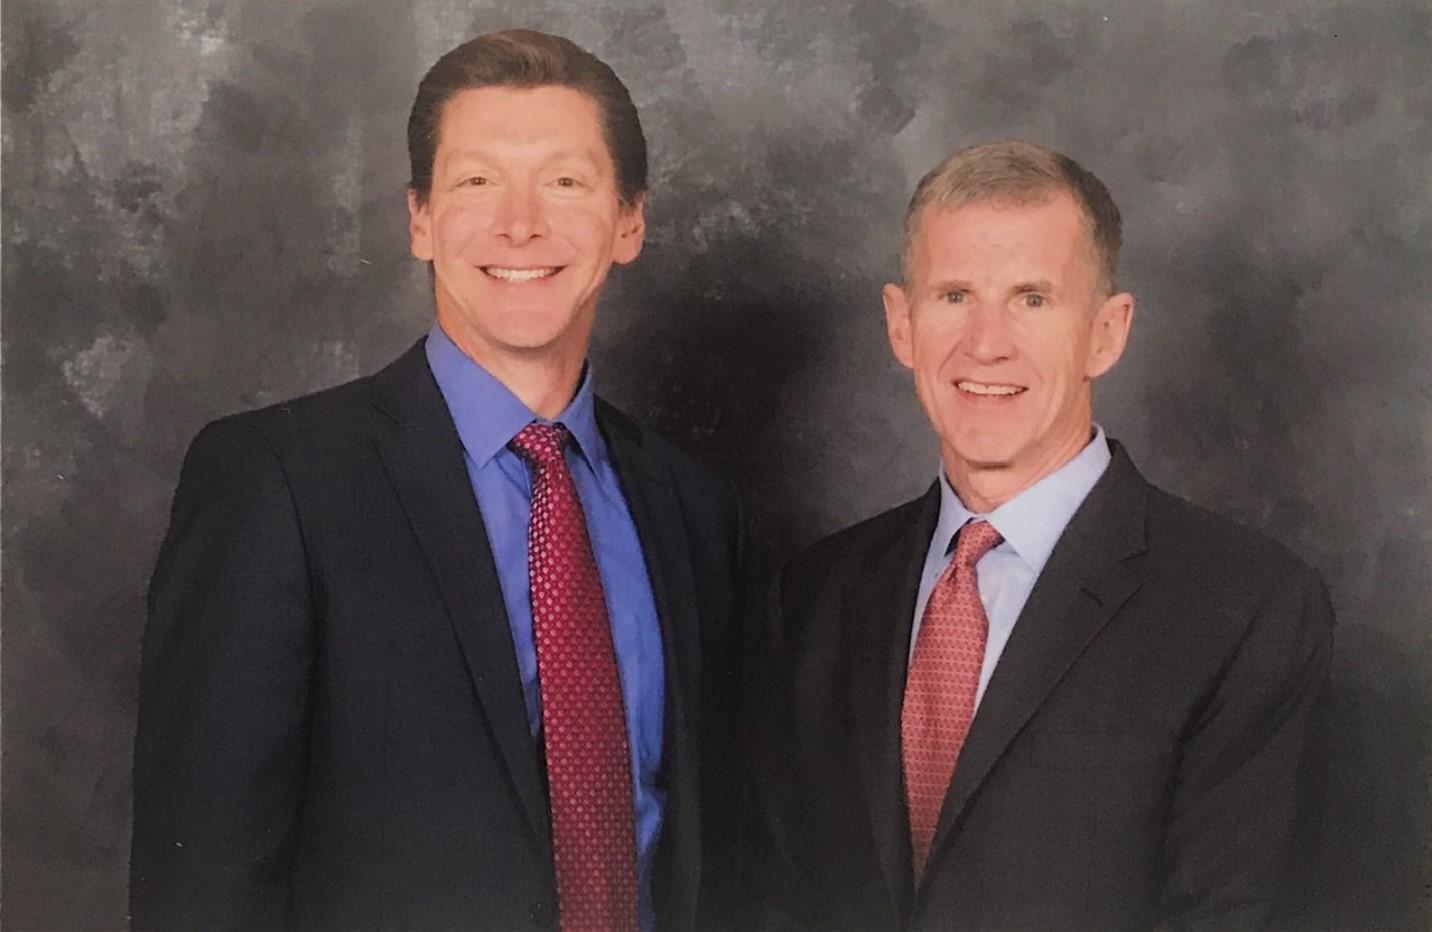 Gen. Stanley McChrystal; March 3, 2017